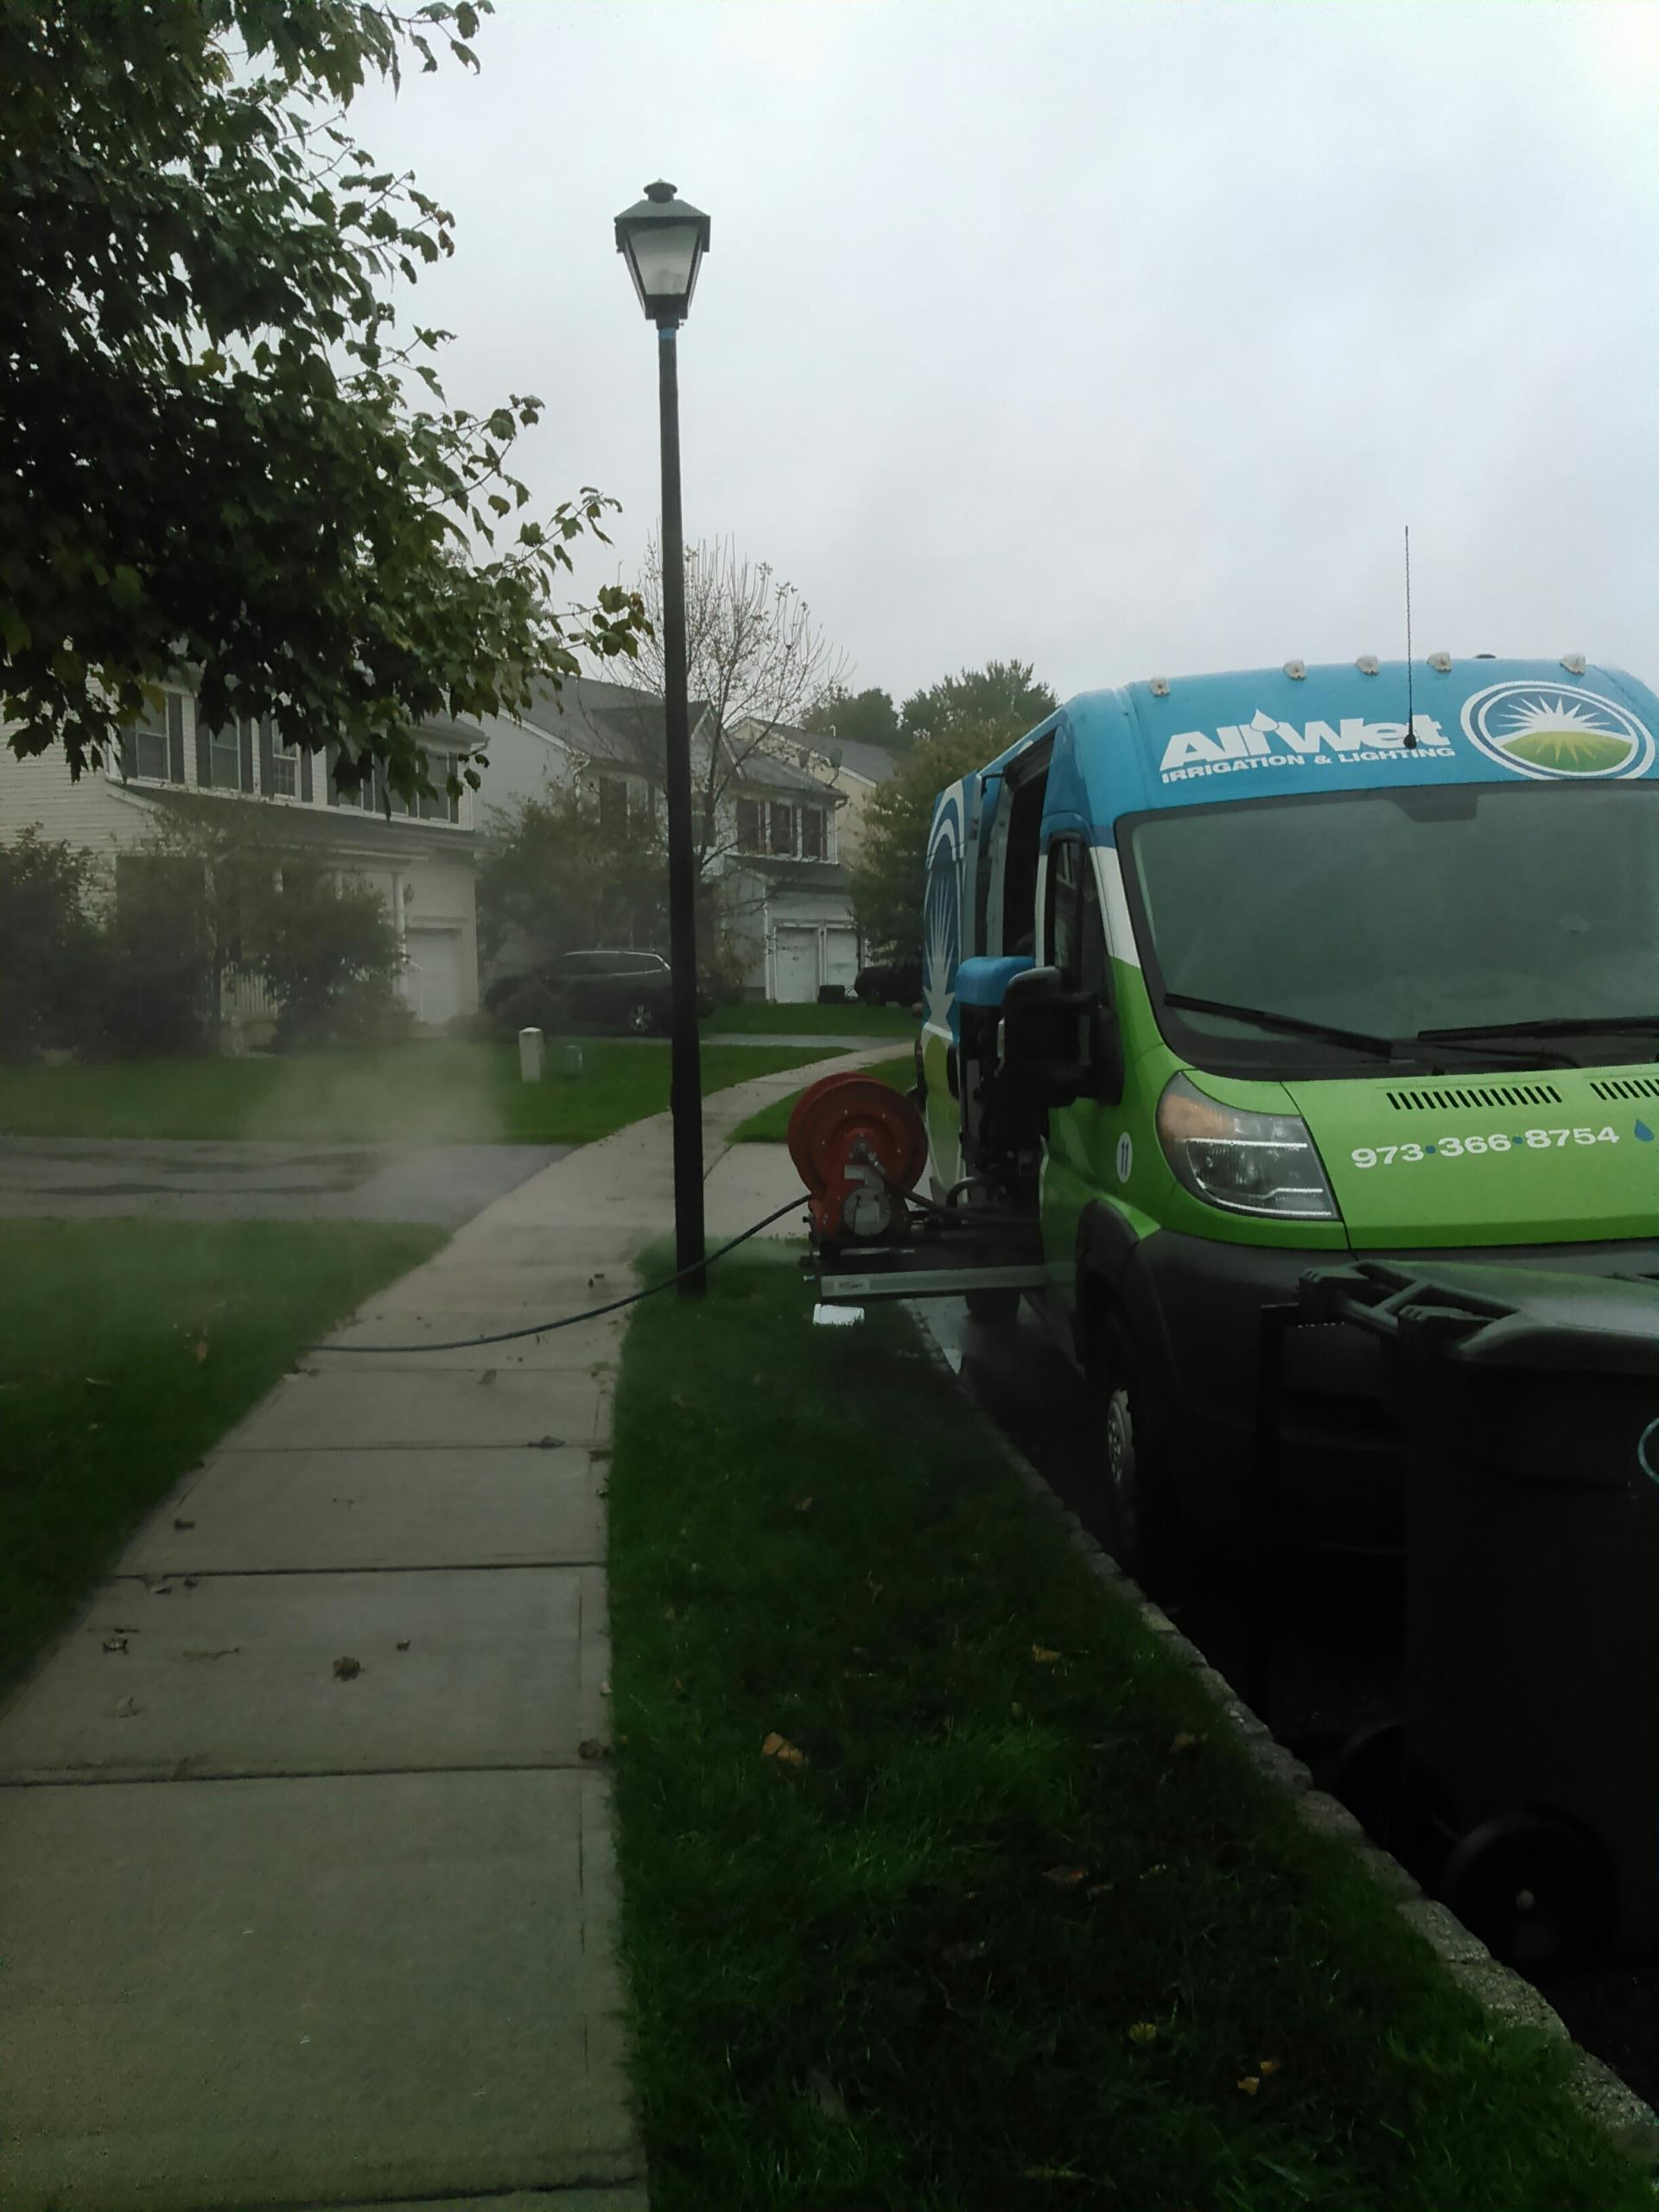 Mount Arlington, NJ - Sprinkler irrigation winterization